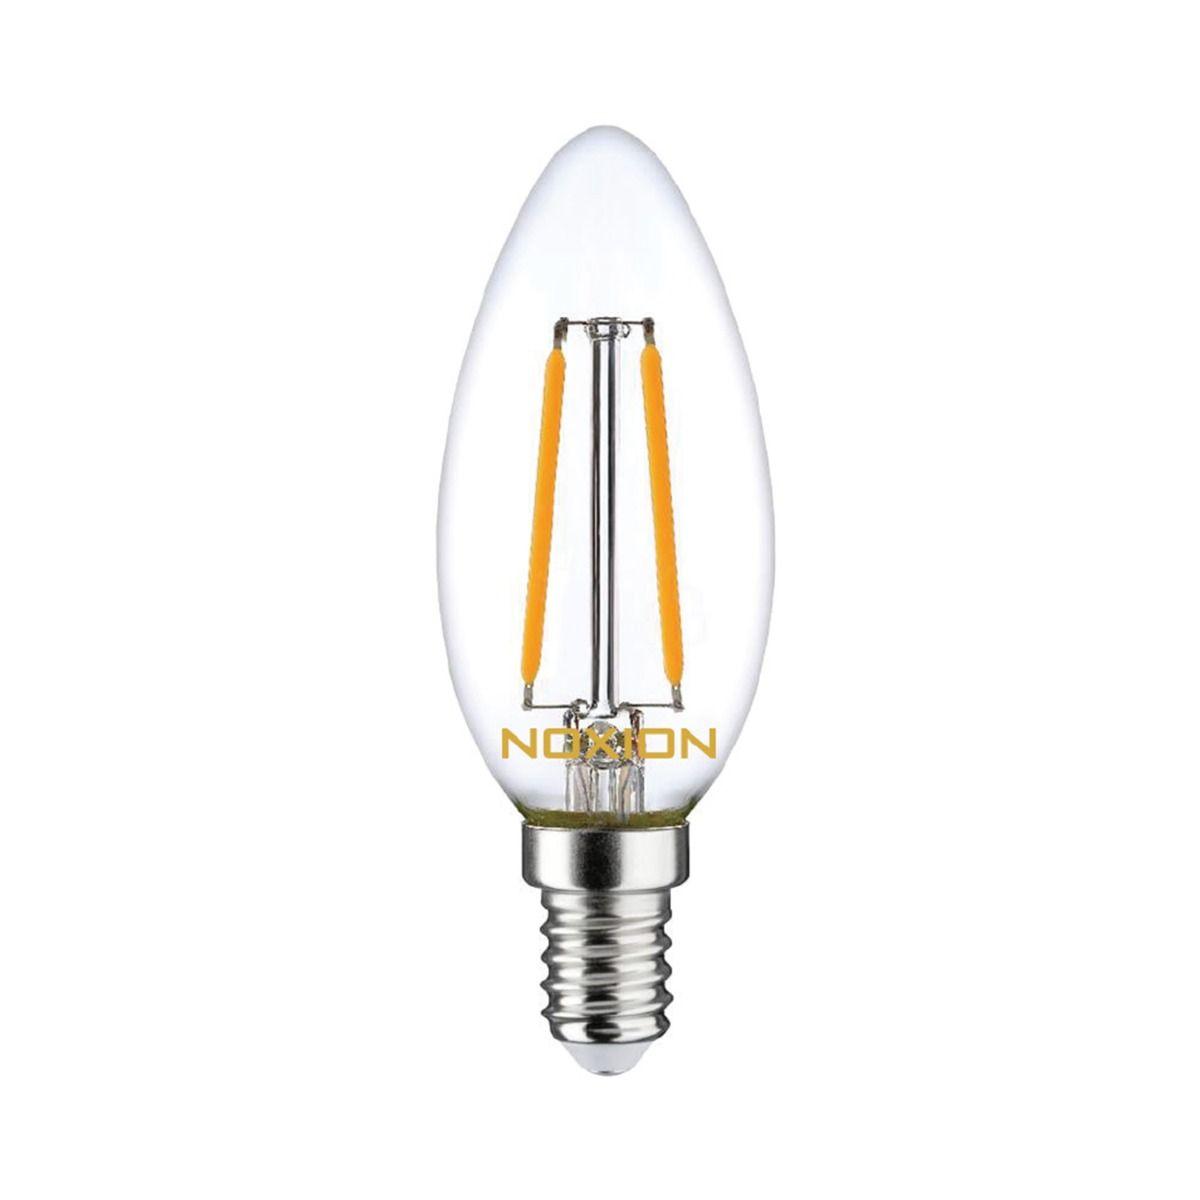 Noxion Lucent con Filamento LED Vela B35 E14 2.5W 250lm 827 | Regulable - Luz muy Cálida - Reemplazo 25W